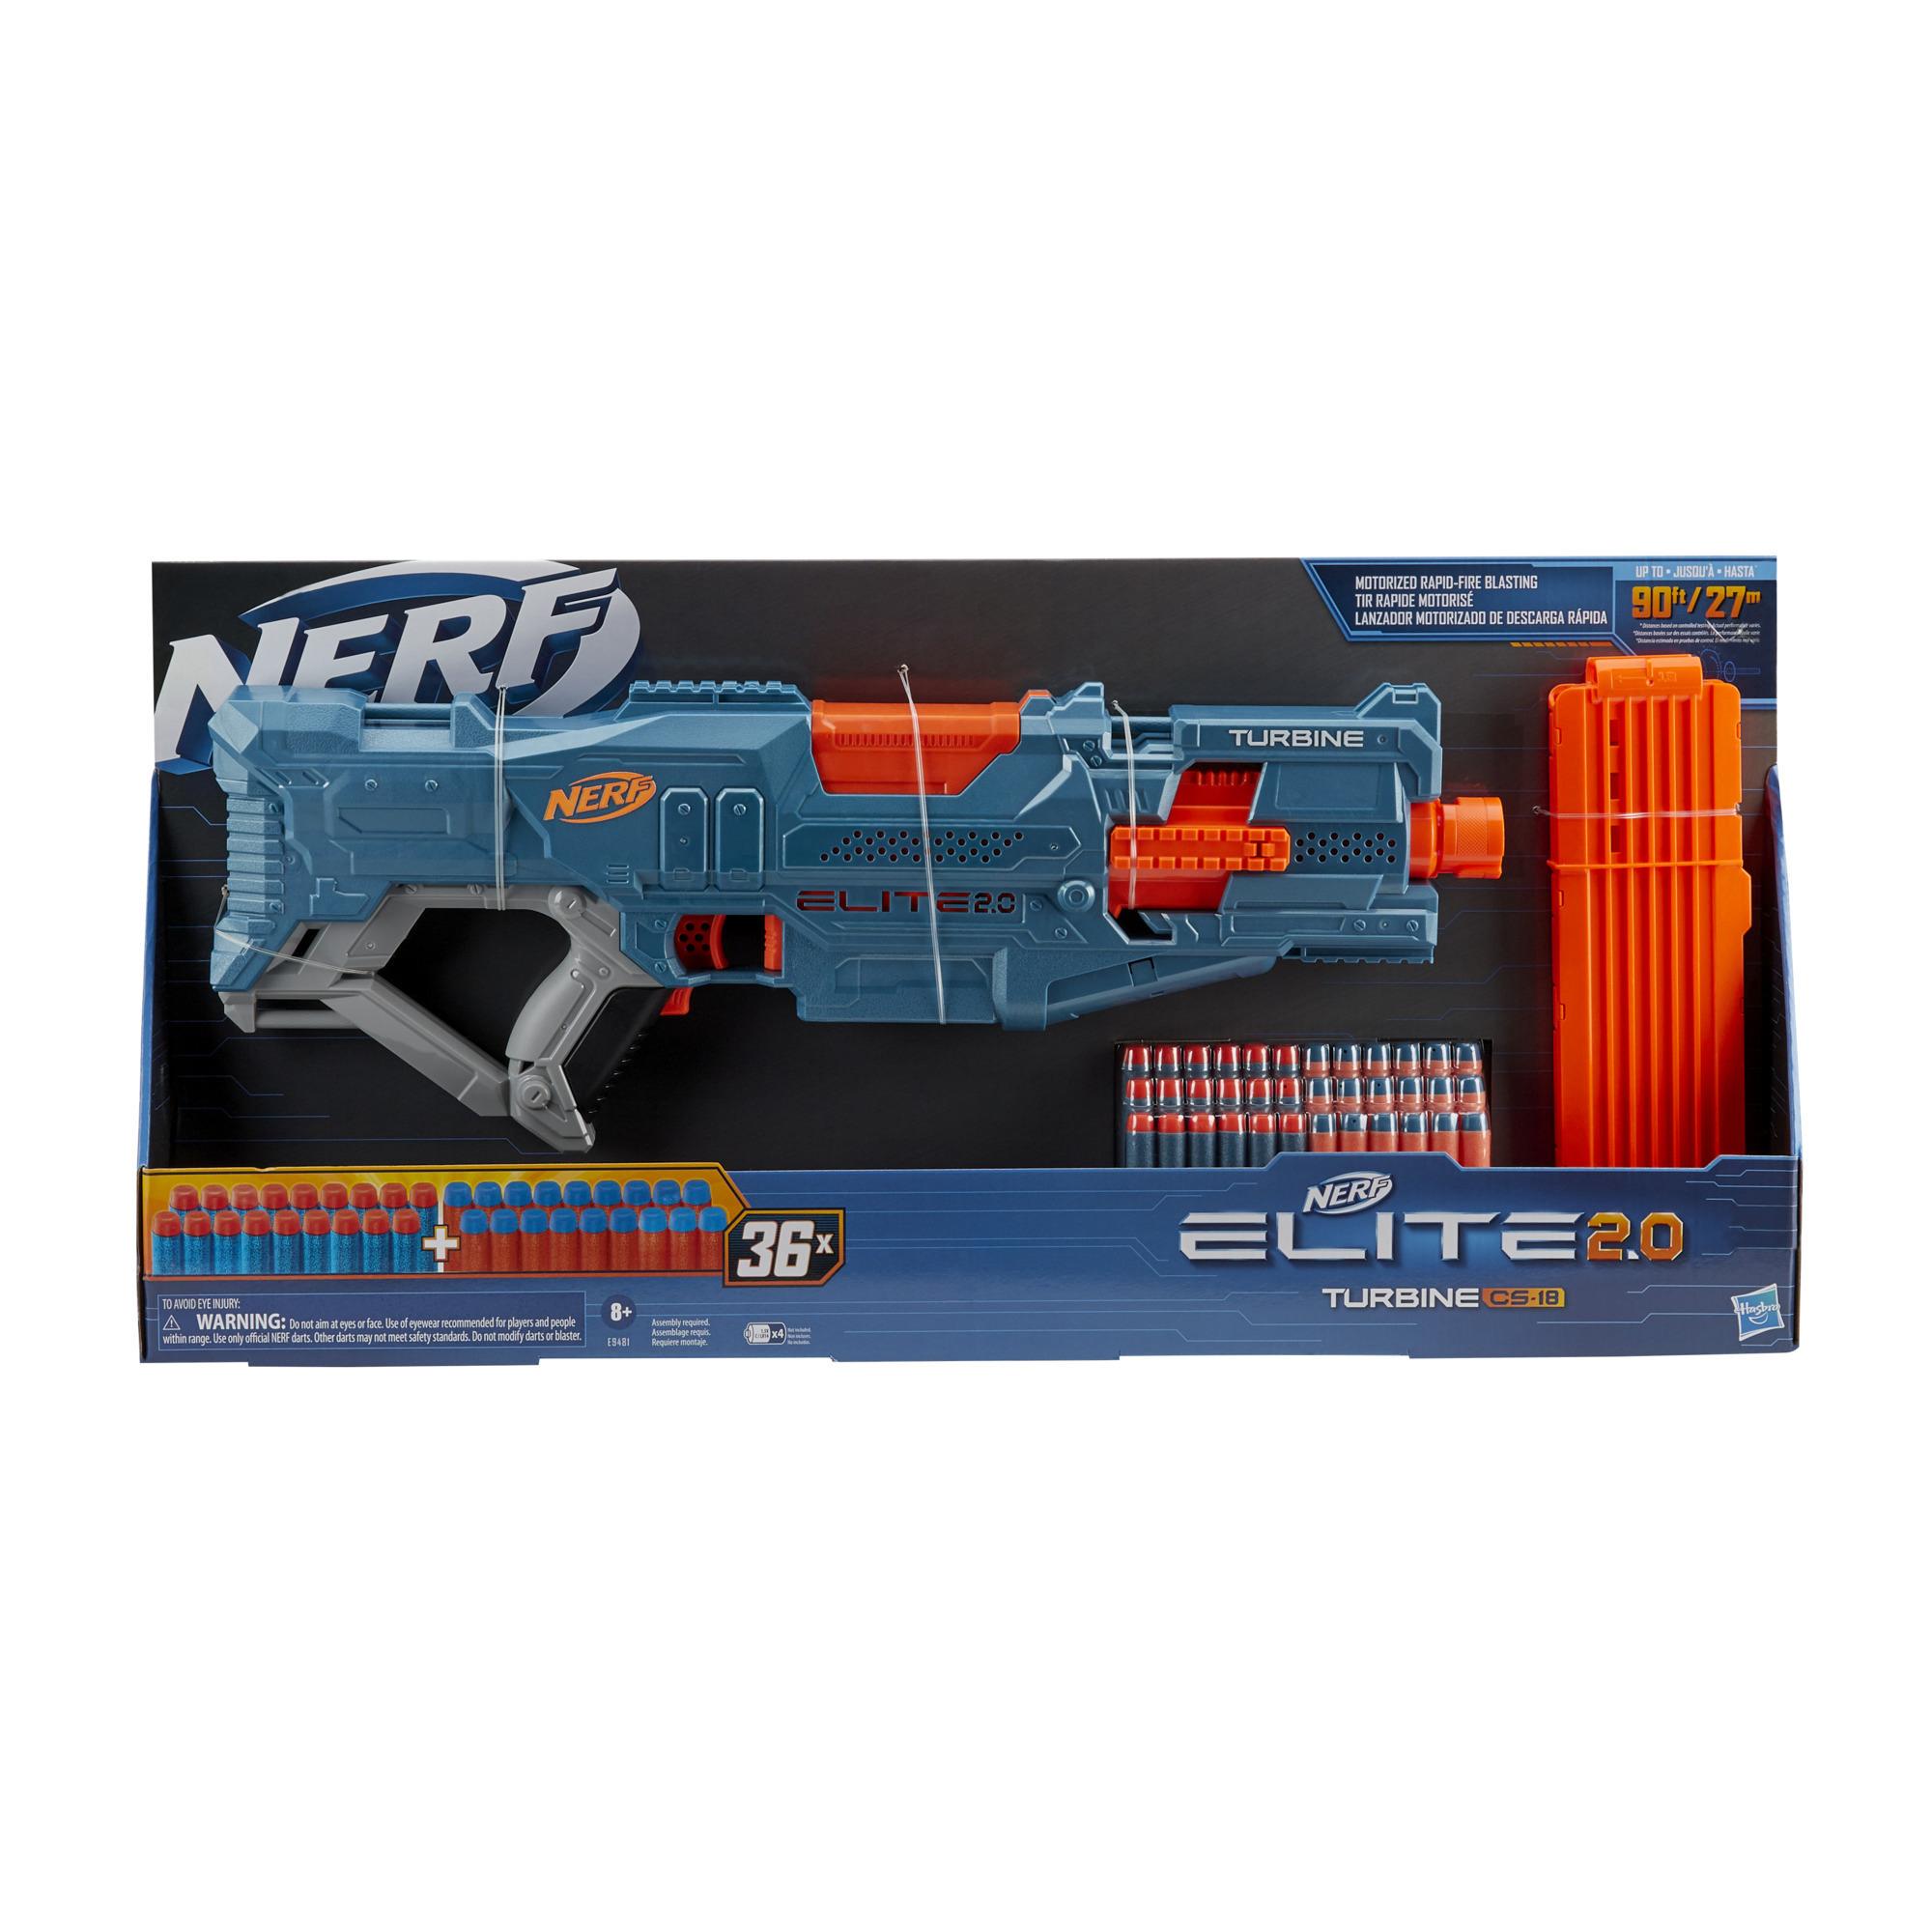 Nerf Elite 2.0 Turbine CS-18 Motorized Blaster, 36 Nerf Darts, 18-Dart Clip, Built-In Customizing Capabilities